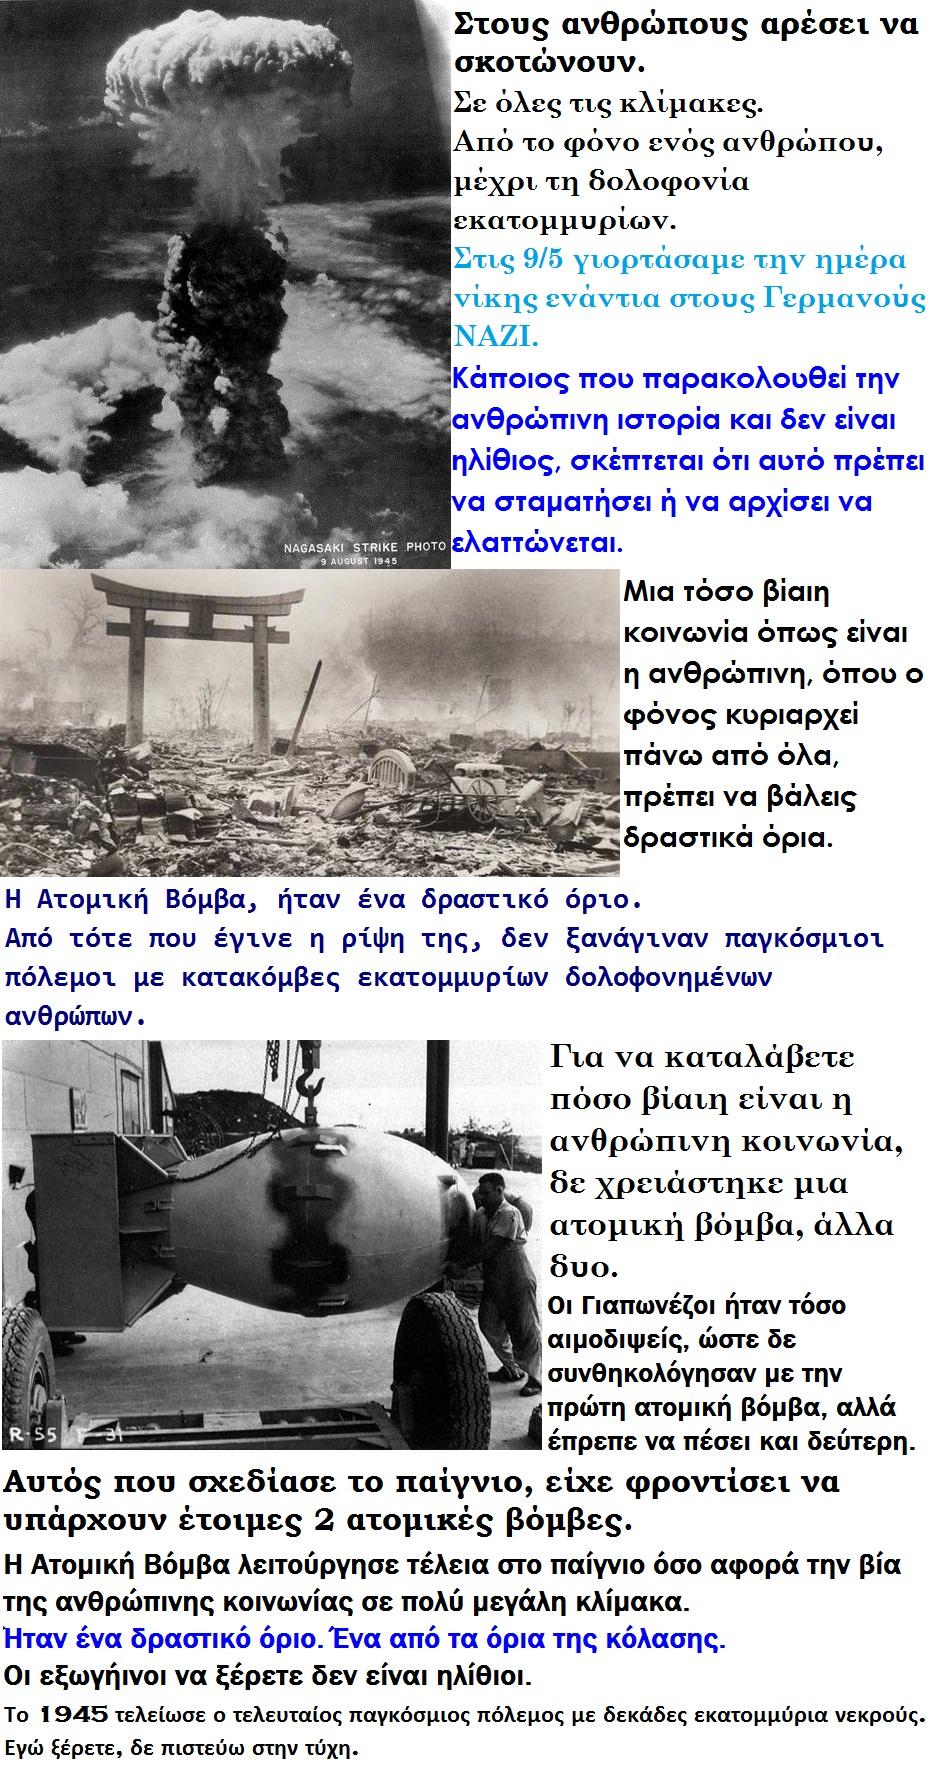 ATOMIC BOMB JAPAN Nagasaki strike 02 120515